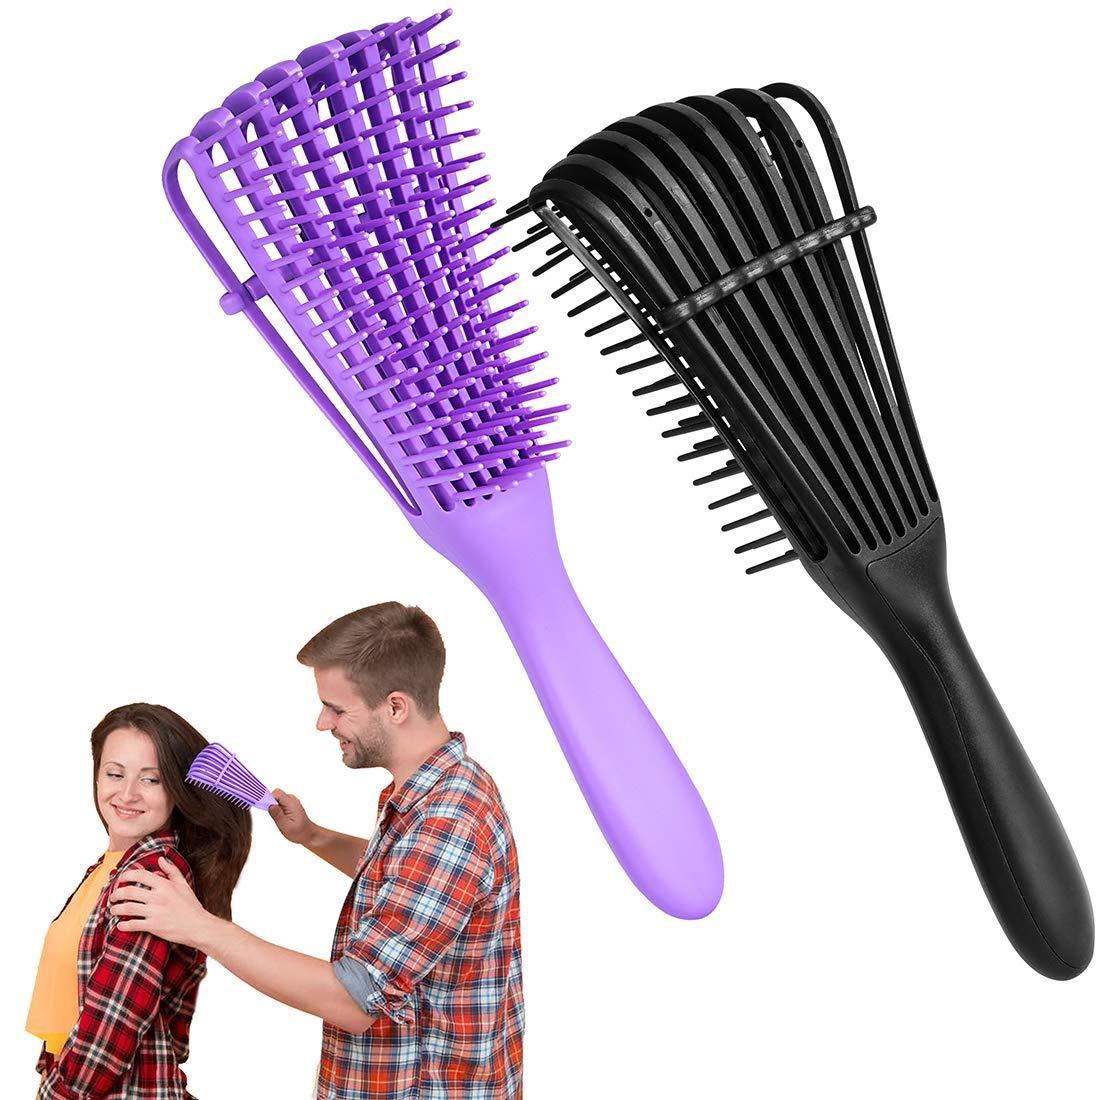 Hunputa Detangler Brush, Easy Detangling Hair Detangle Brush Curve for Wet or Dry Brush for Curly Thick Straight Coily American Afro 3a to 4c Textured Hair for Lovers &Couples & Kids (Black & Purple)